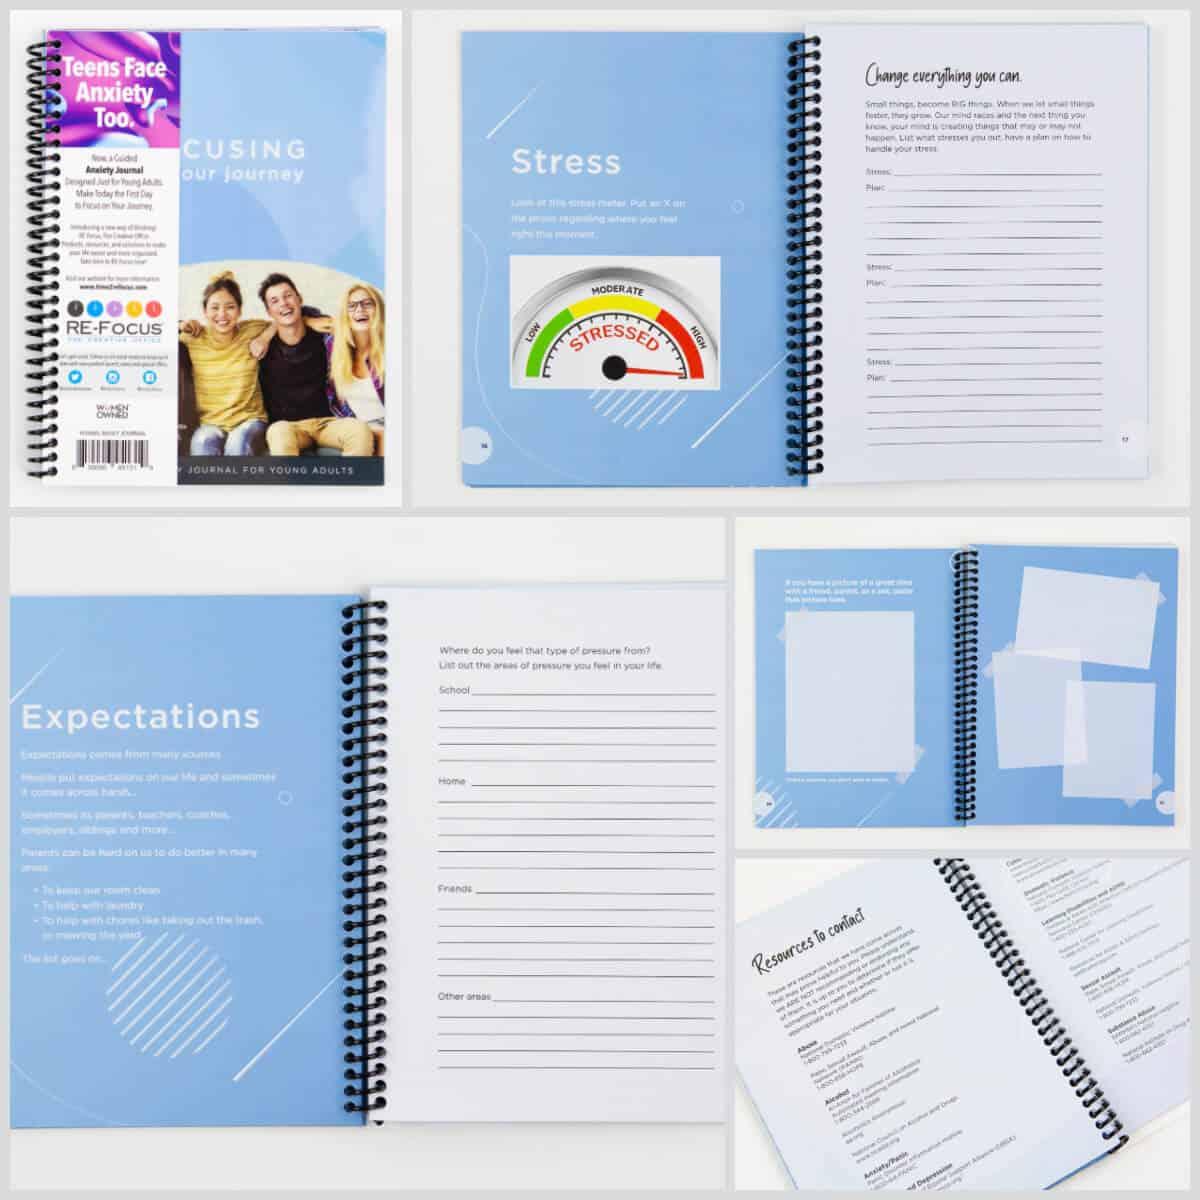 Re-Focusing Journal